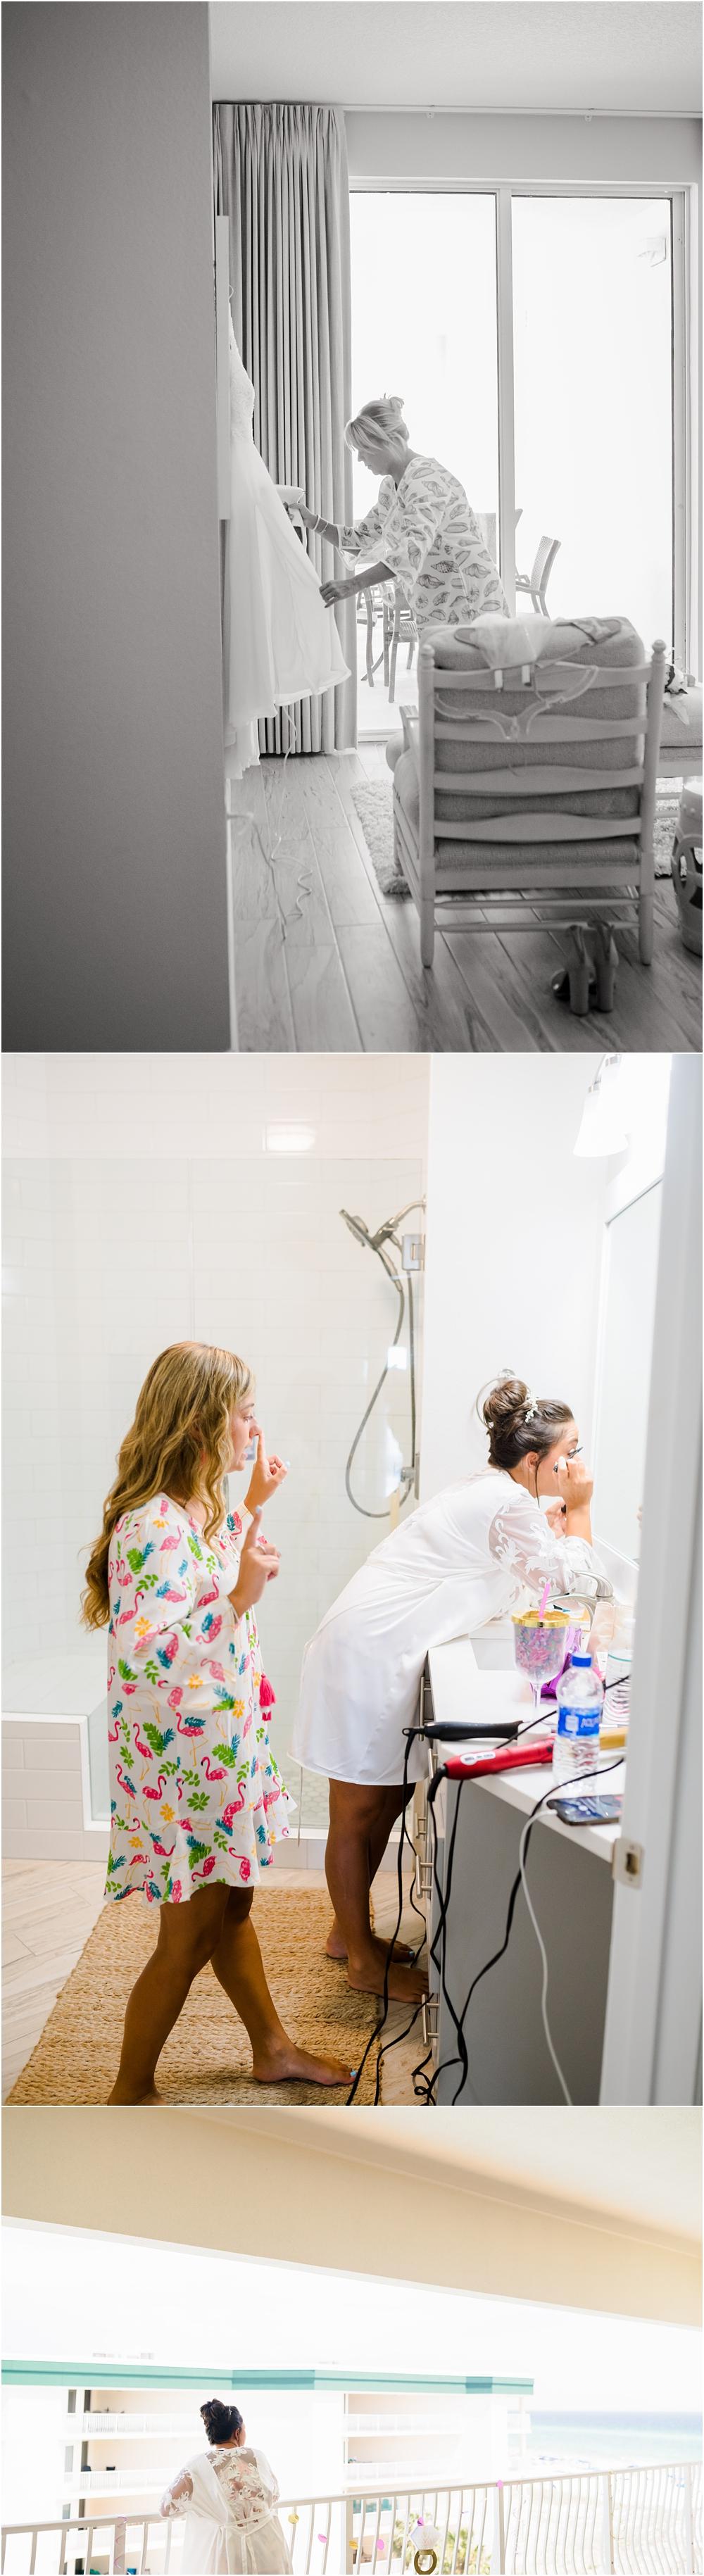 solaris-yacht-destin-florida-wedding-kiersten-stevenson-photography11.jpg